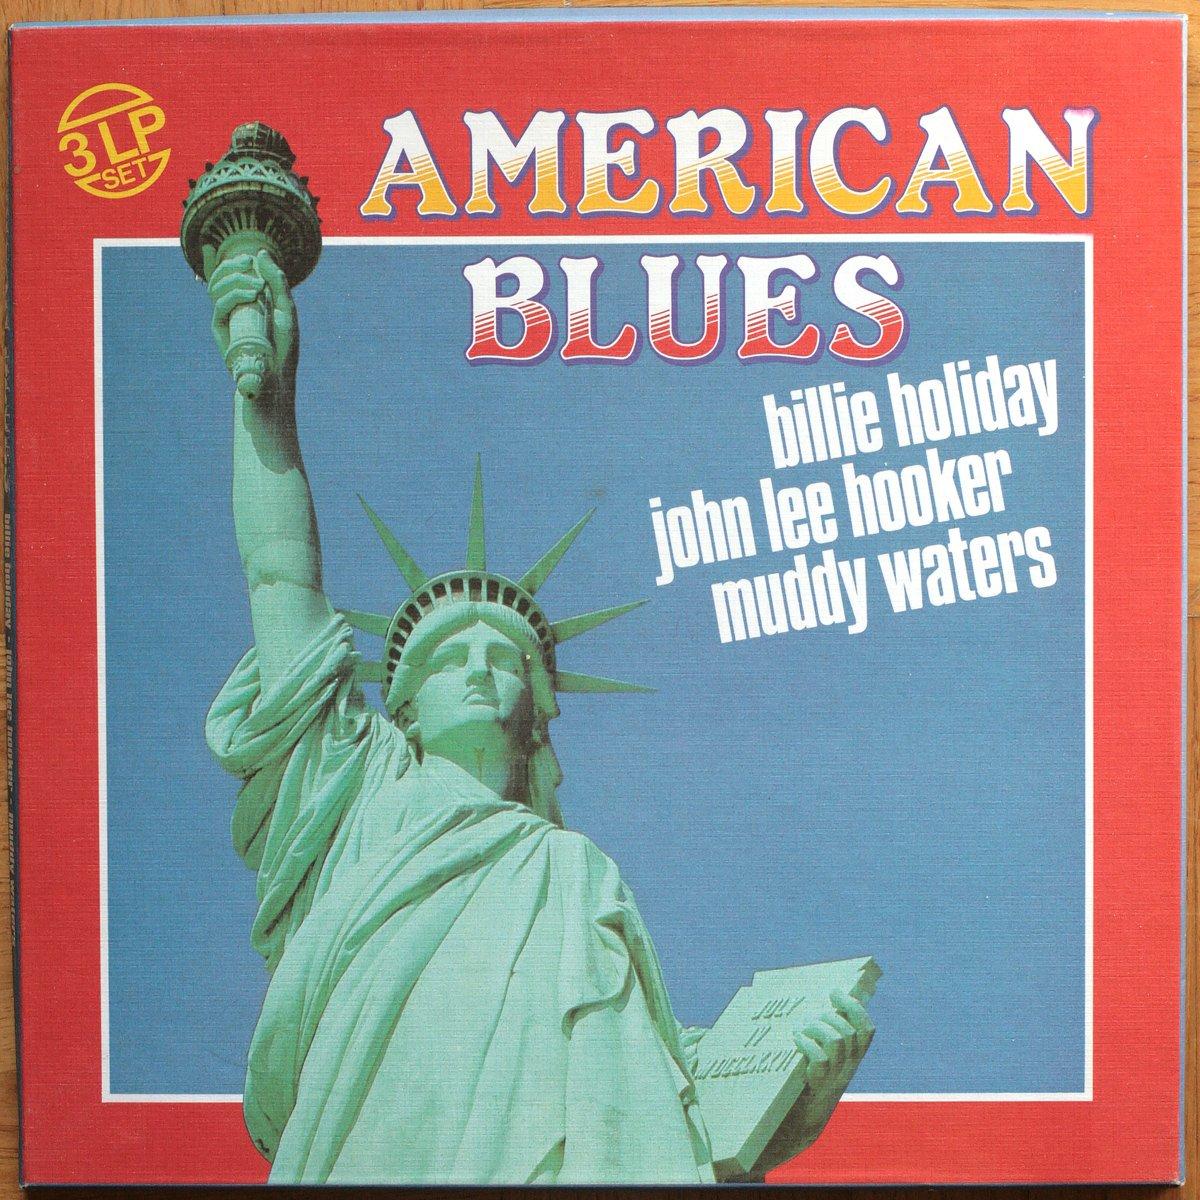 American Blues • Billie Holiday – Billie's Blues • John Lee Hooker – Blues Before Sunrise • Muddy Waters – Sweet Home Chicago